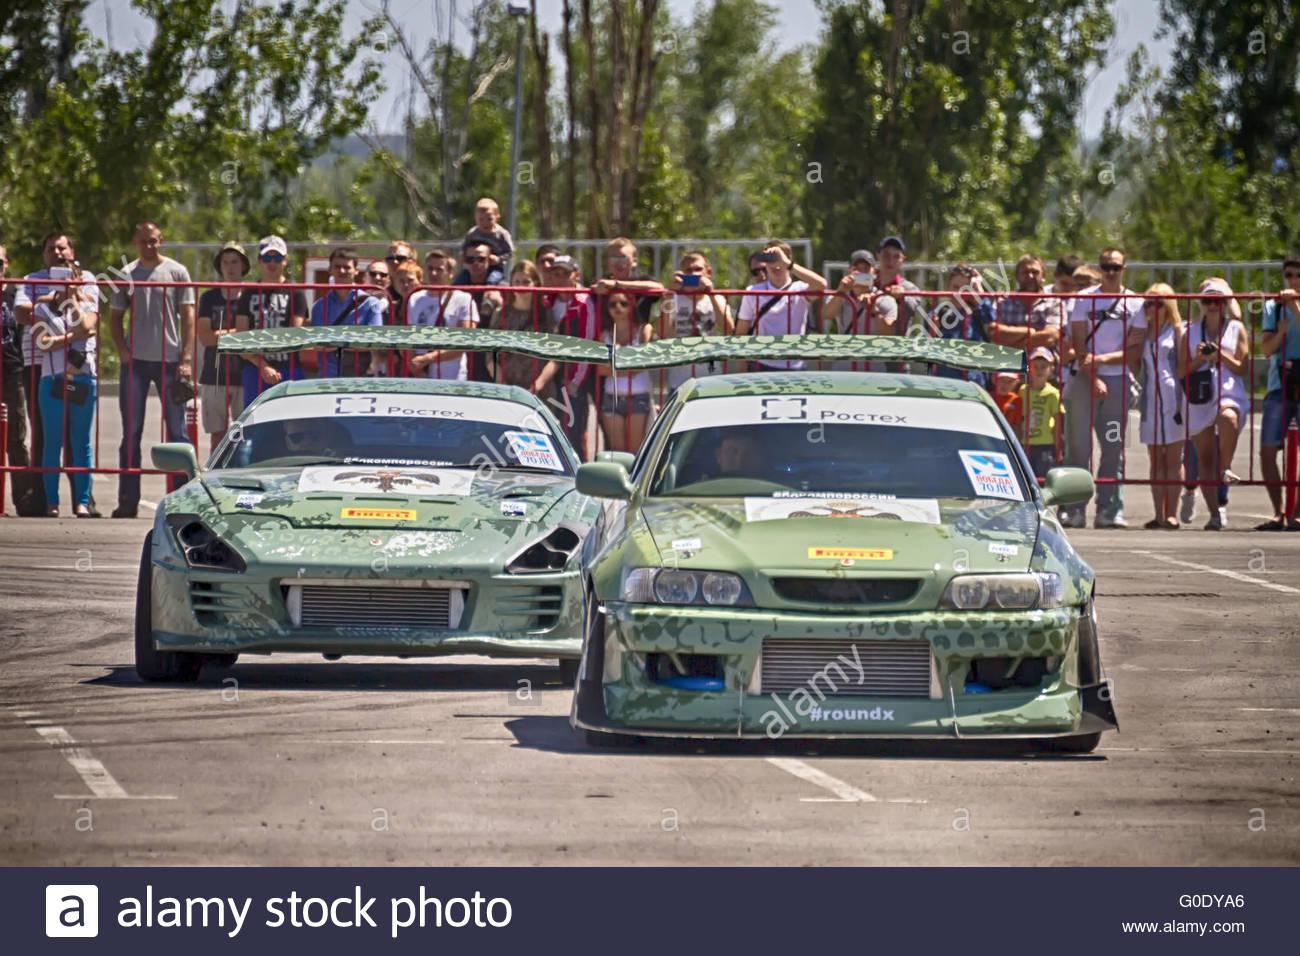 Drift cars team Round-X go near a short distance - Stock Image